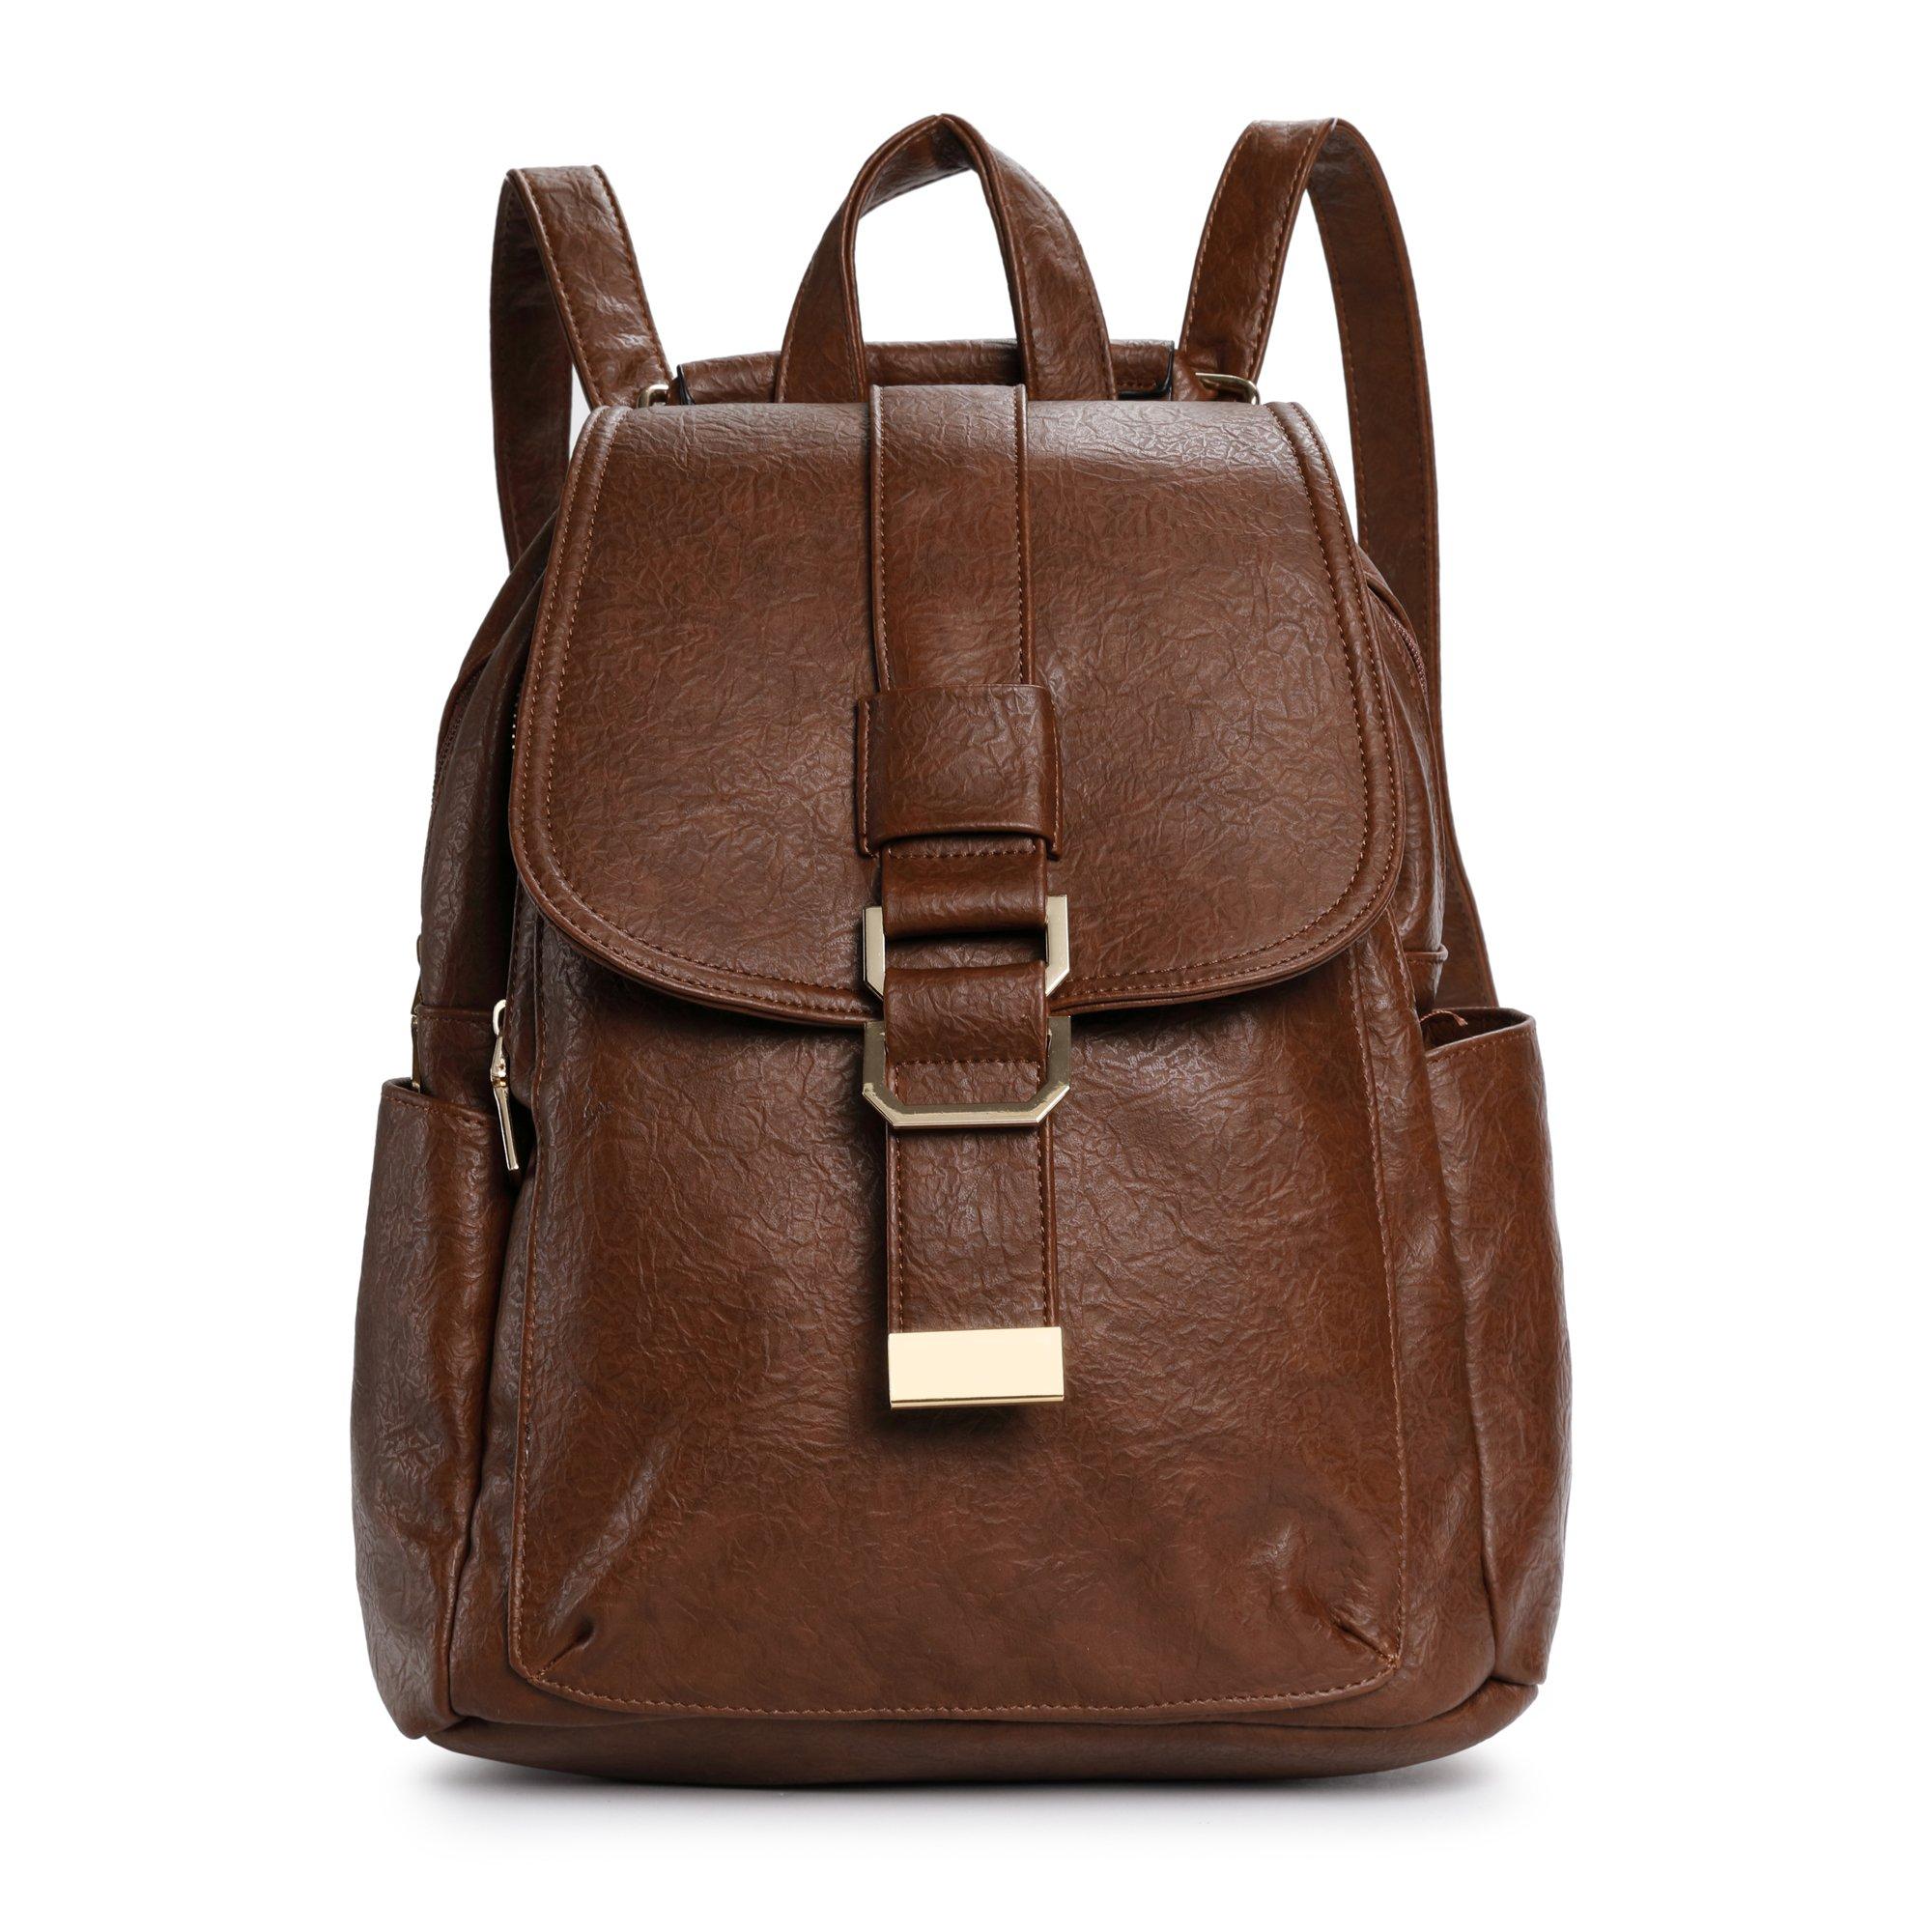 Leather Shoulder Handbag For Women Retro Crossbody Tote Top Handle Bag Hobo Bags For Ladies Office Work Camel